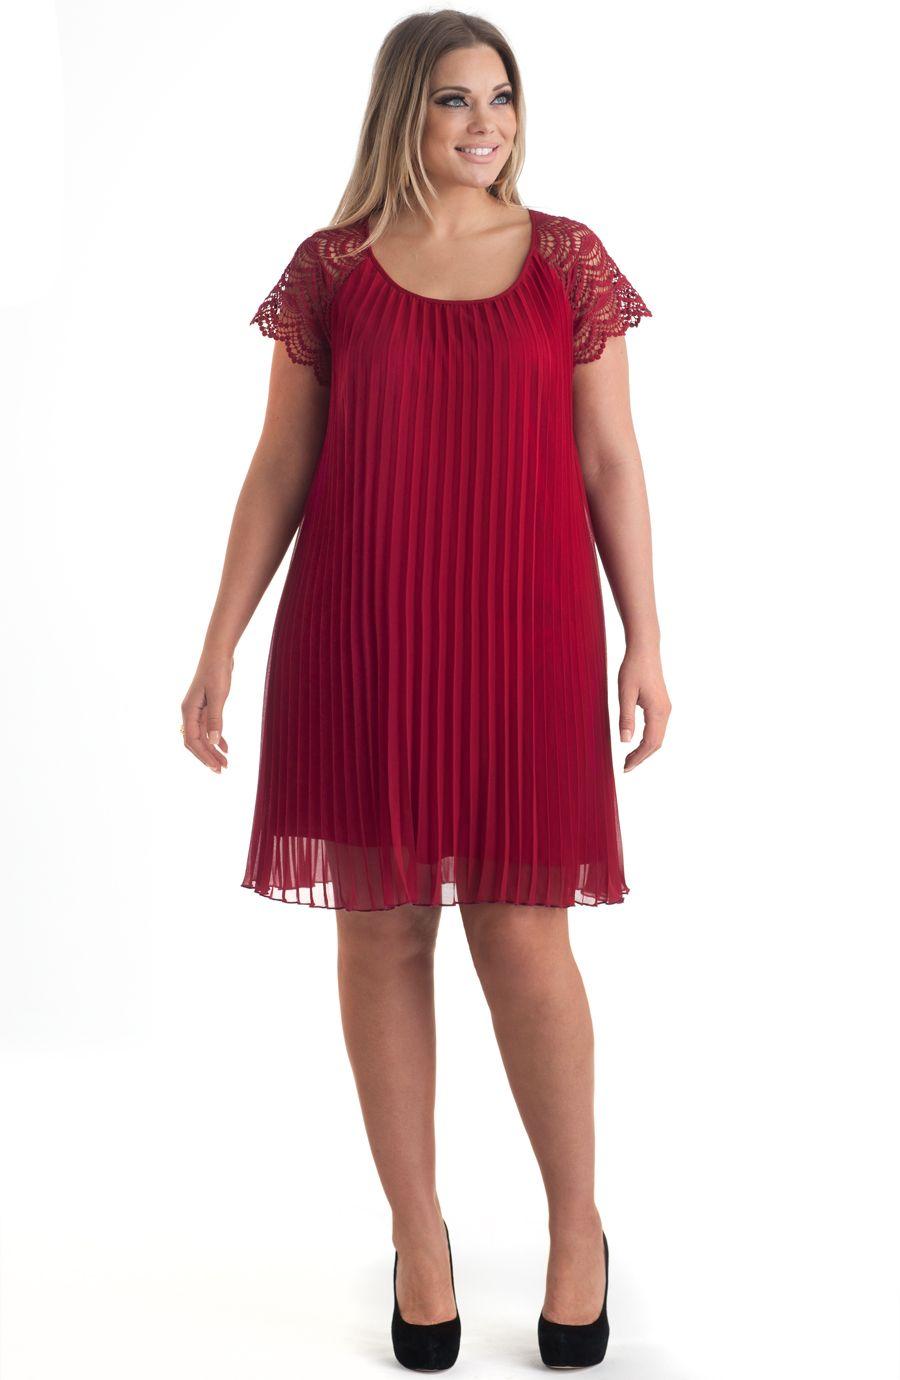 9a955c37e7c Plus Size Dresses Stores In Melbourne - Data Dynamic AG